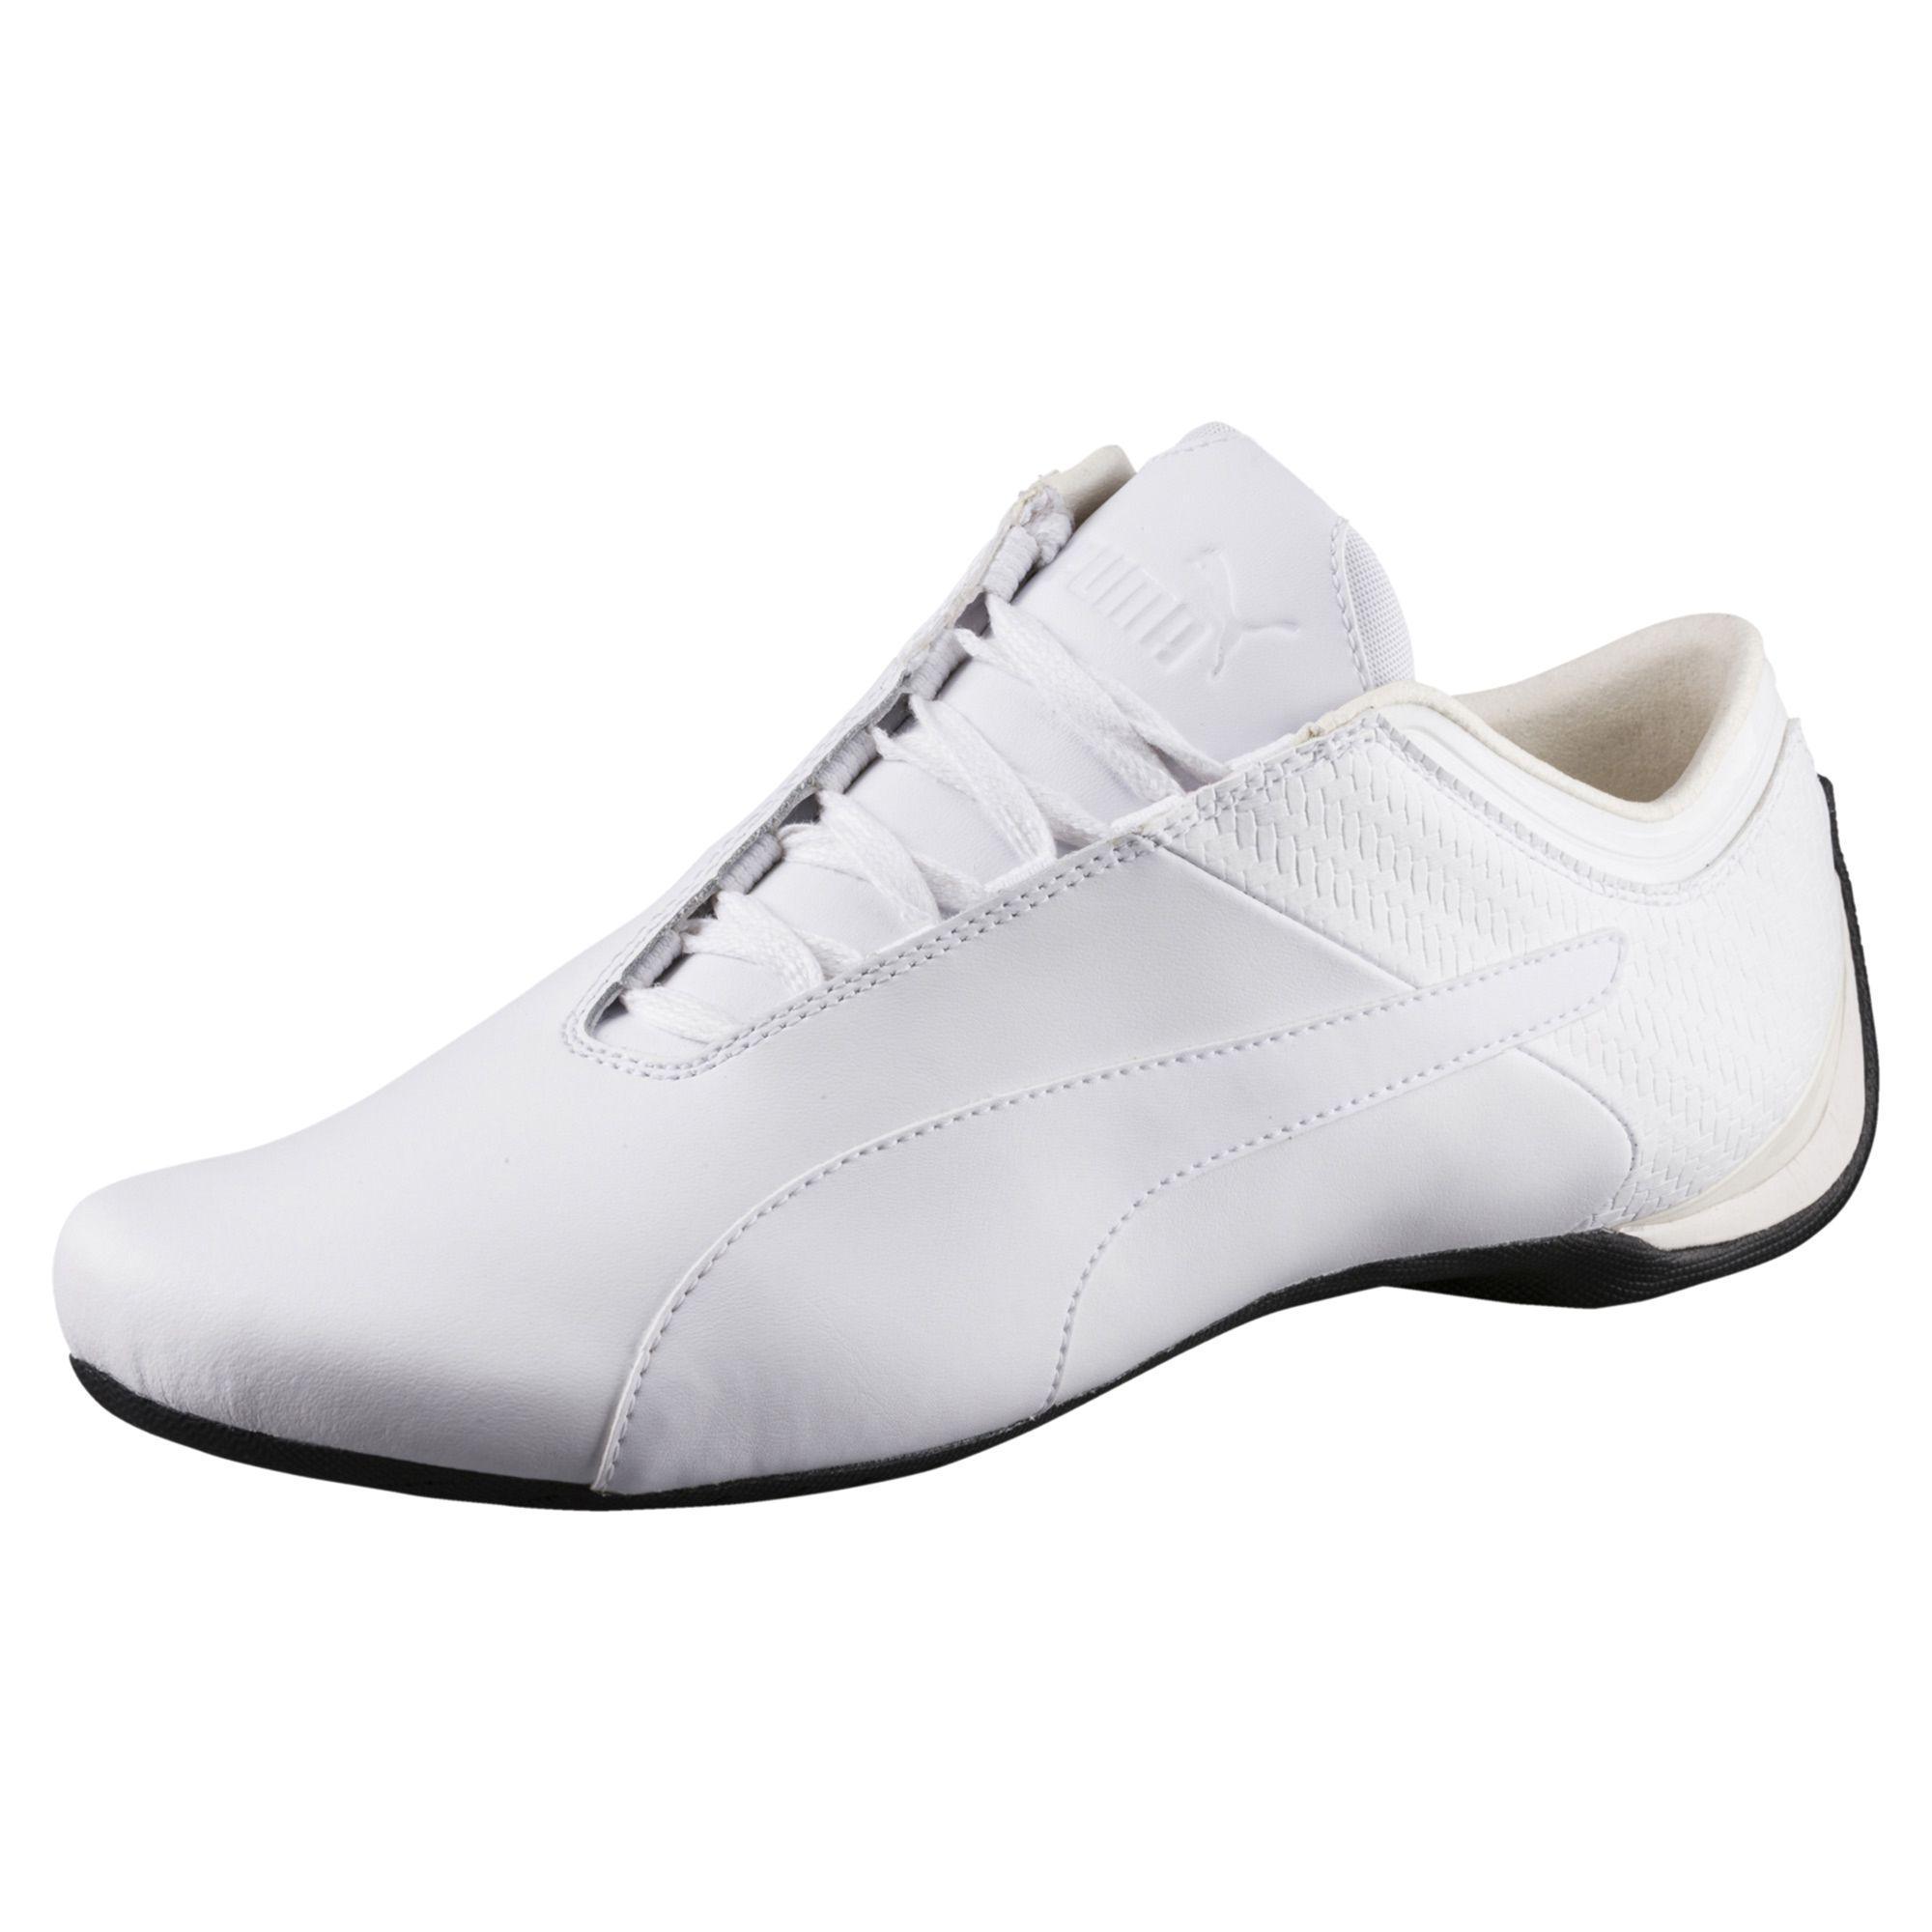 Citi Trends Mens Shoes